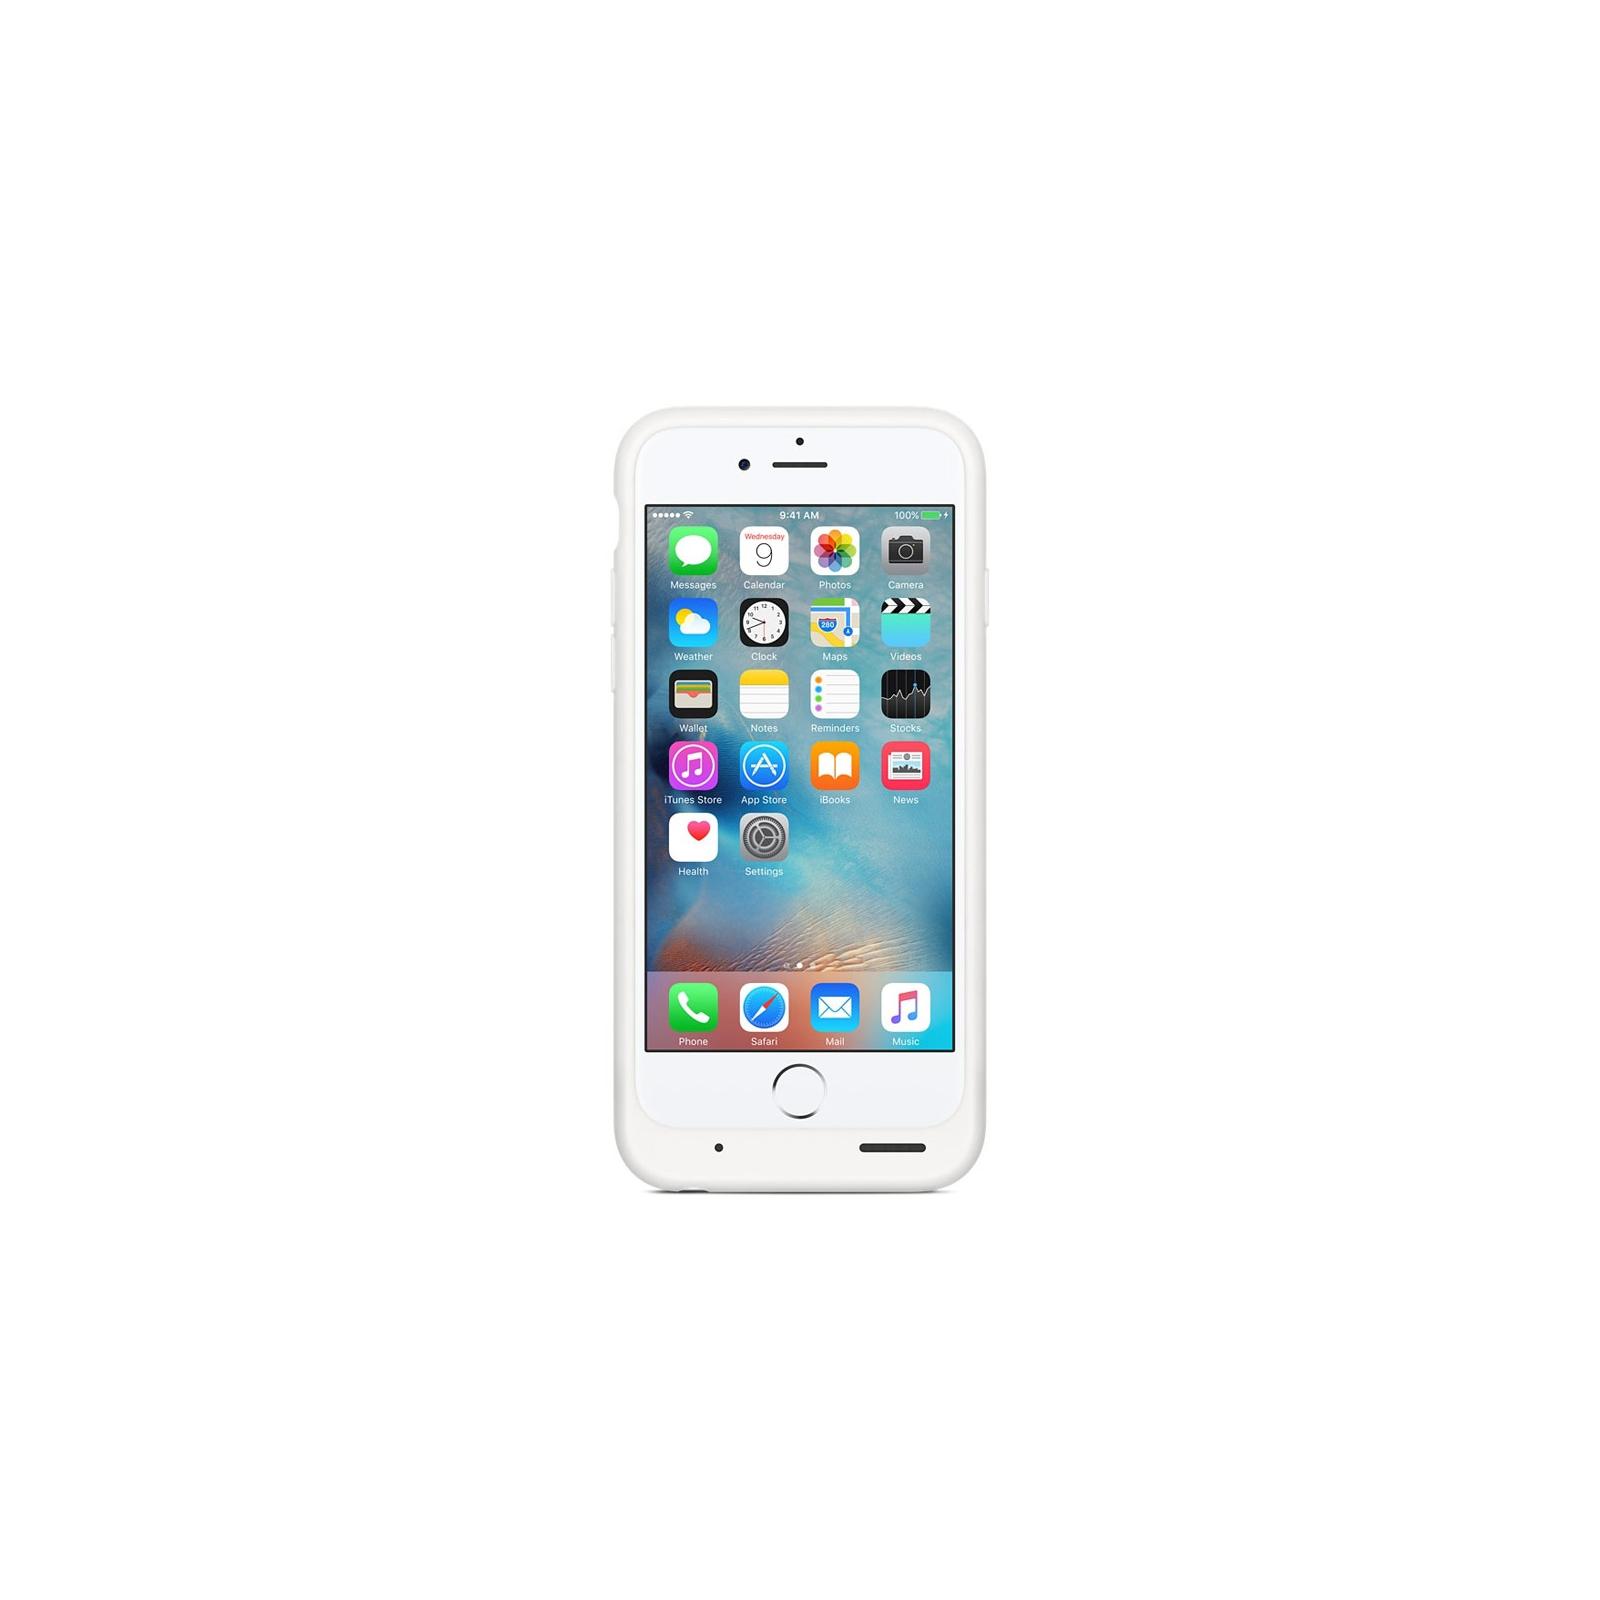 Чехол для моб. телефона Apple Smart Battery Case для iPhone 6/6s White (MGQM2ZM/A) изображение 4